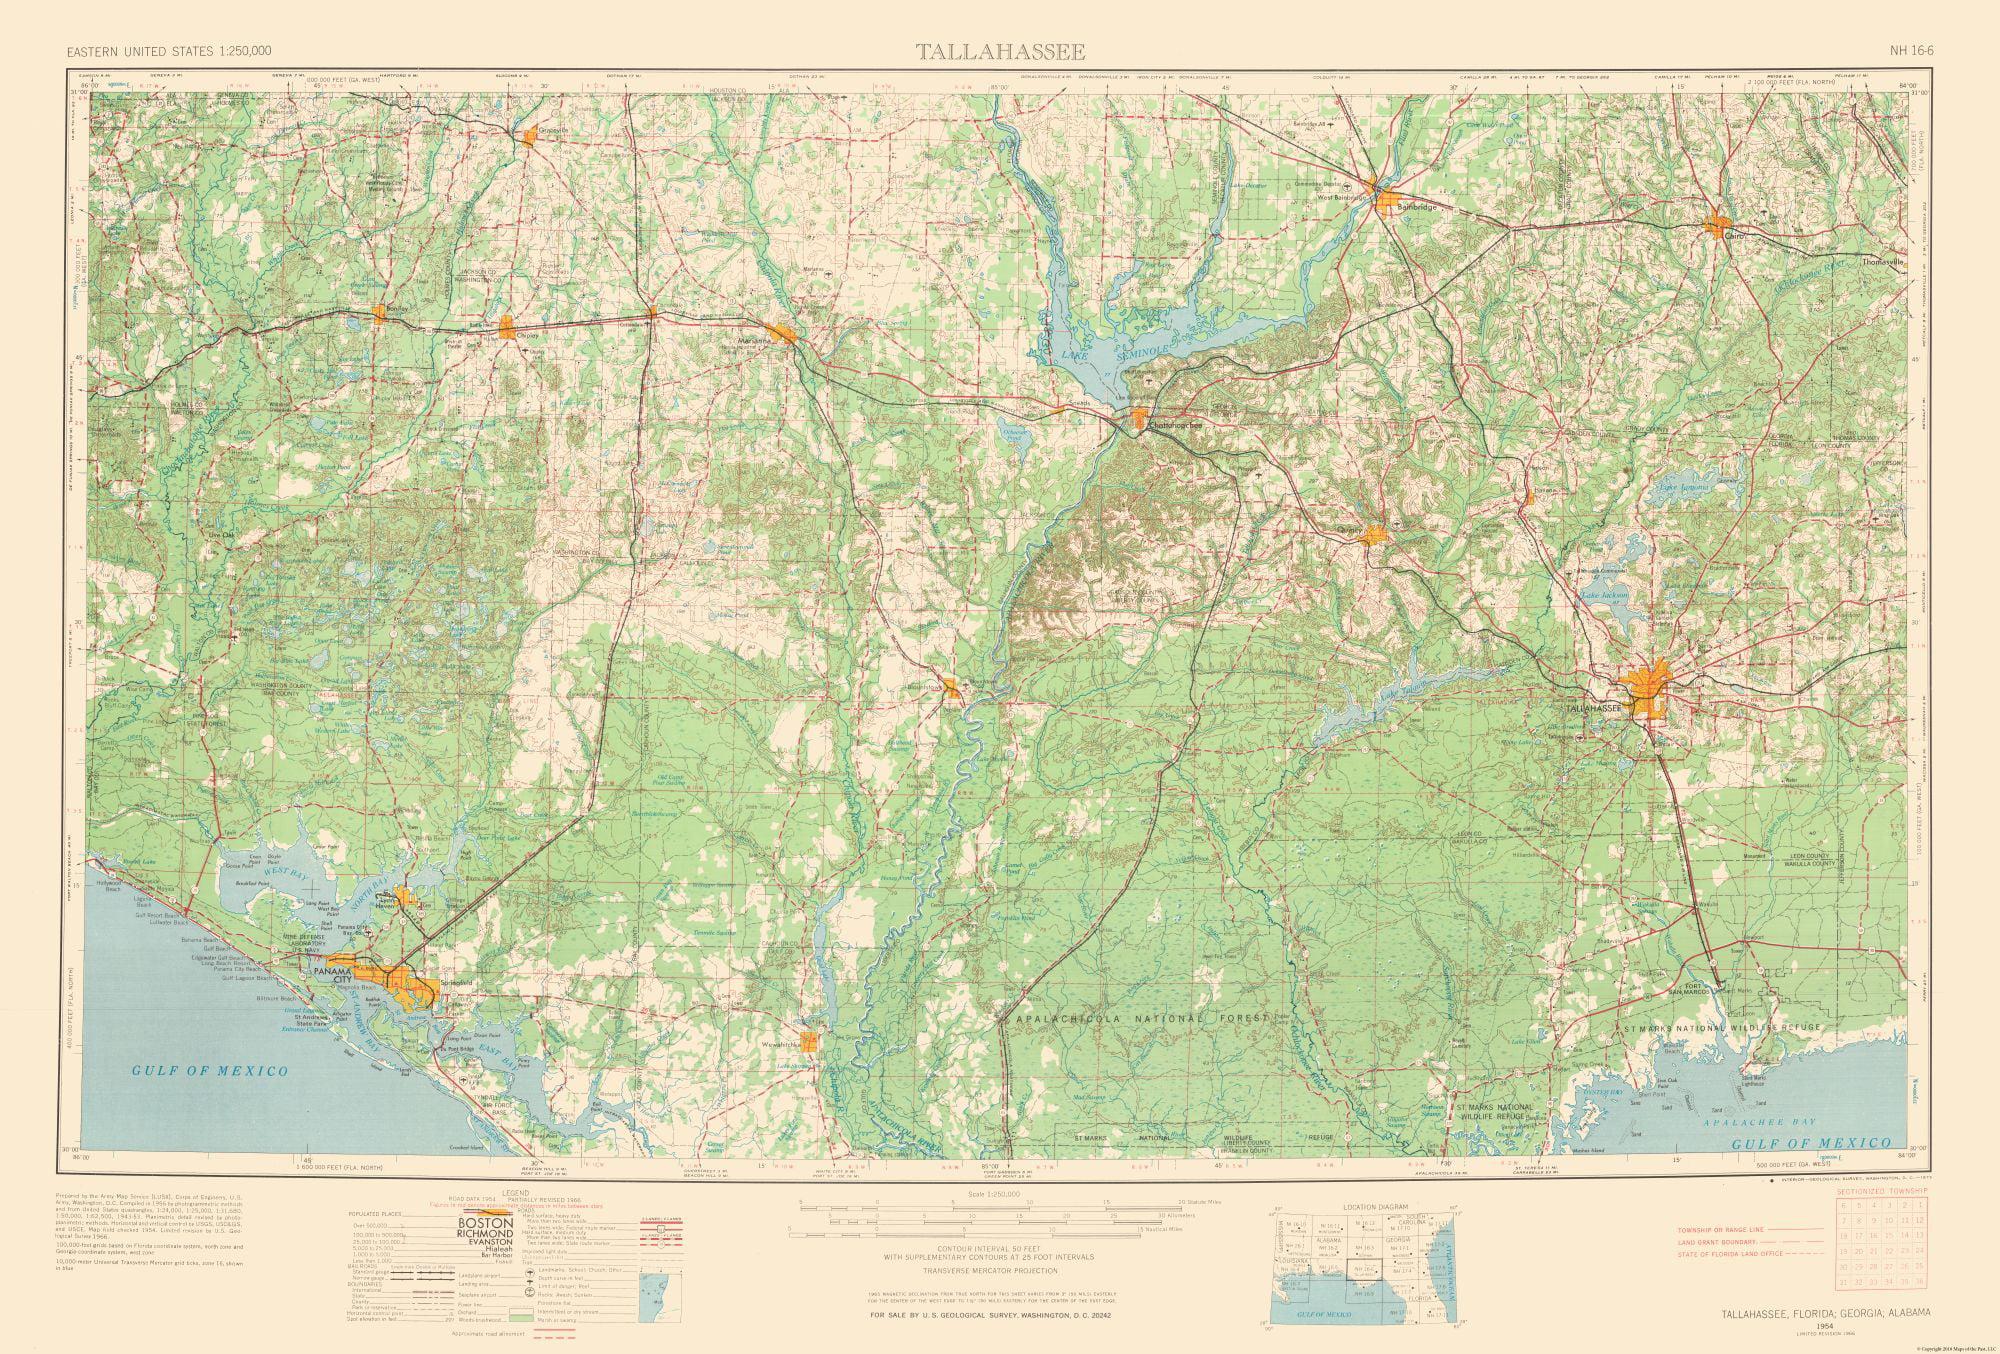 Topographic Map - Tallahassee Florida Quad - USGS 1954 - 33.98 x 23